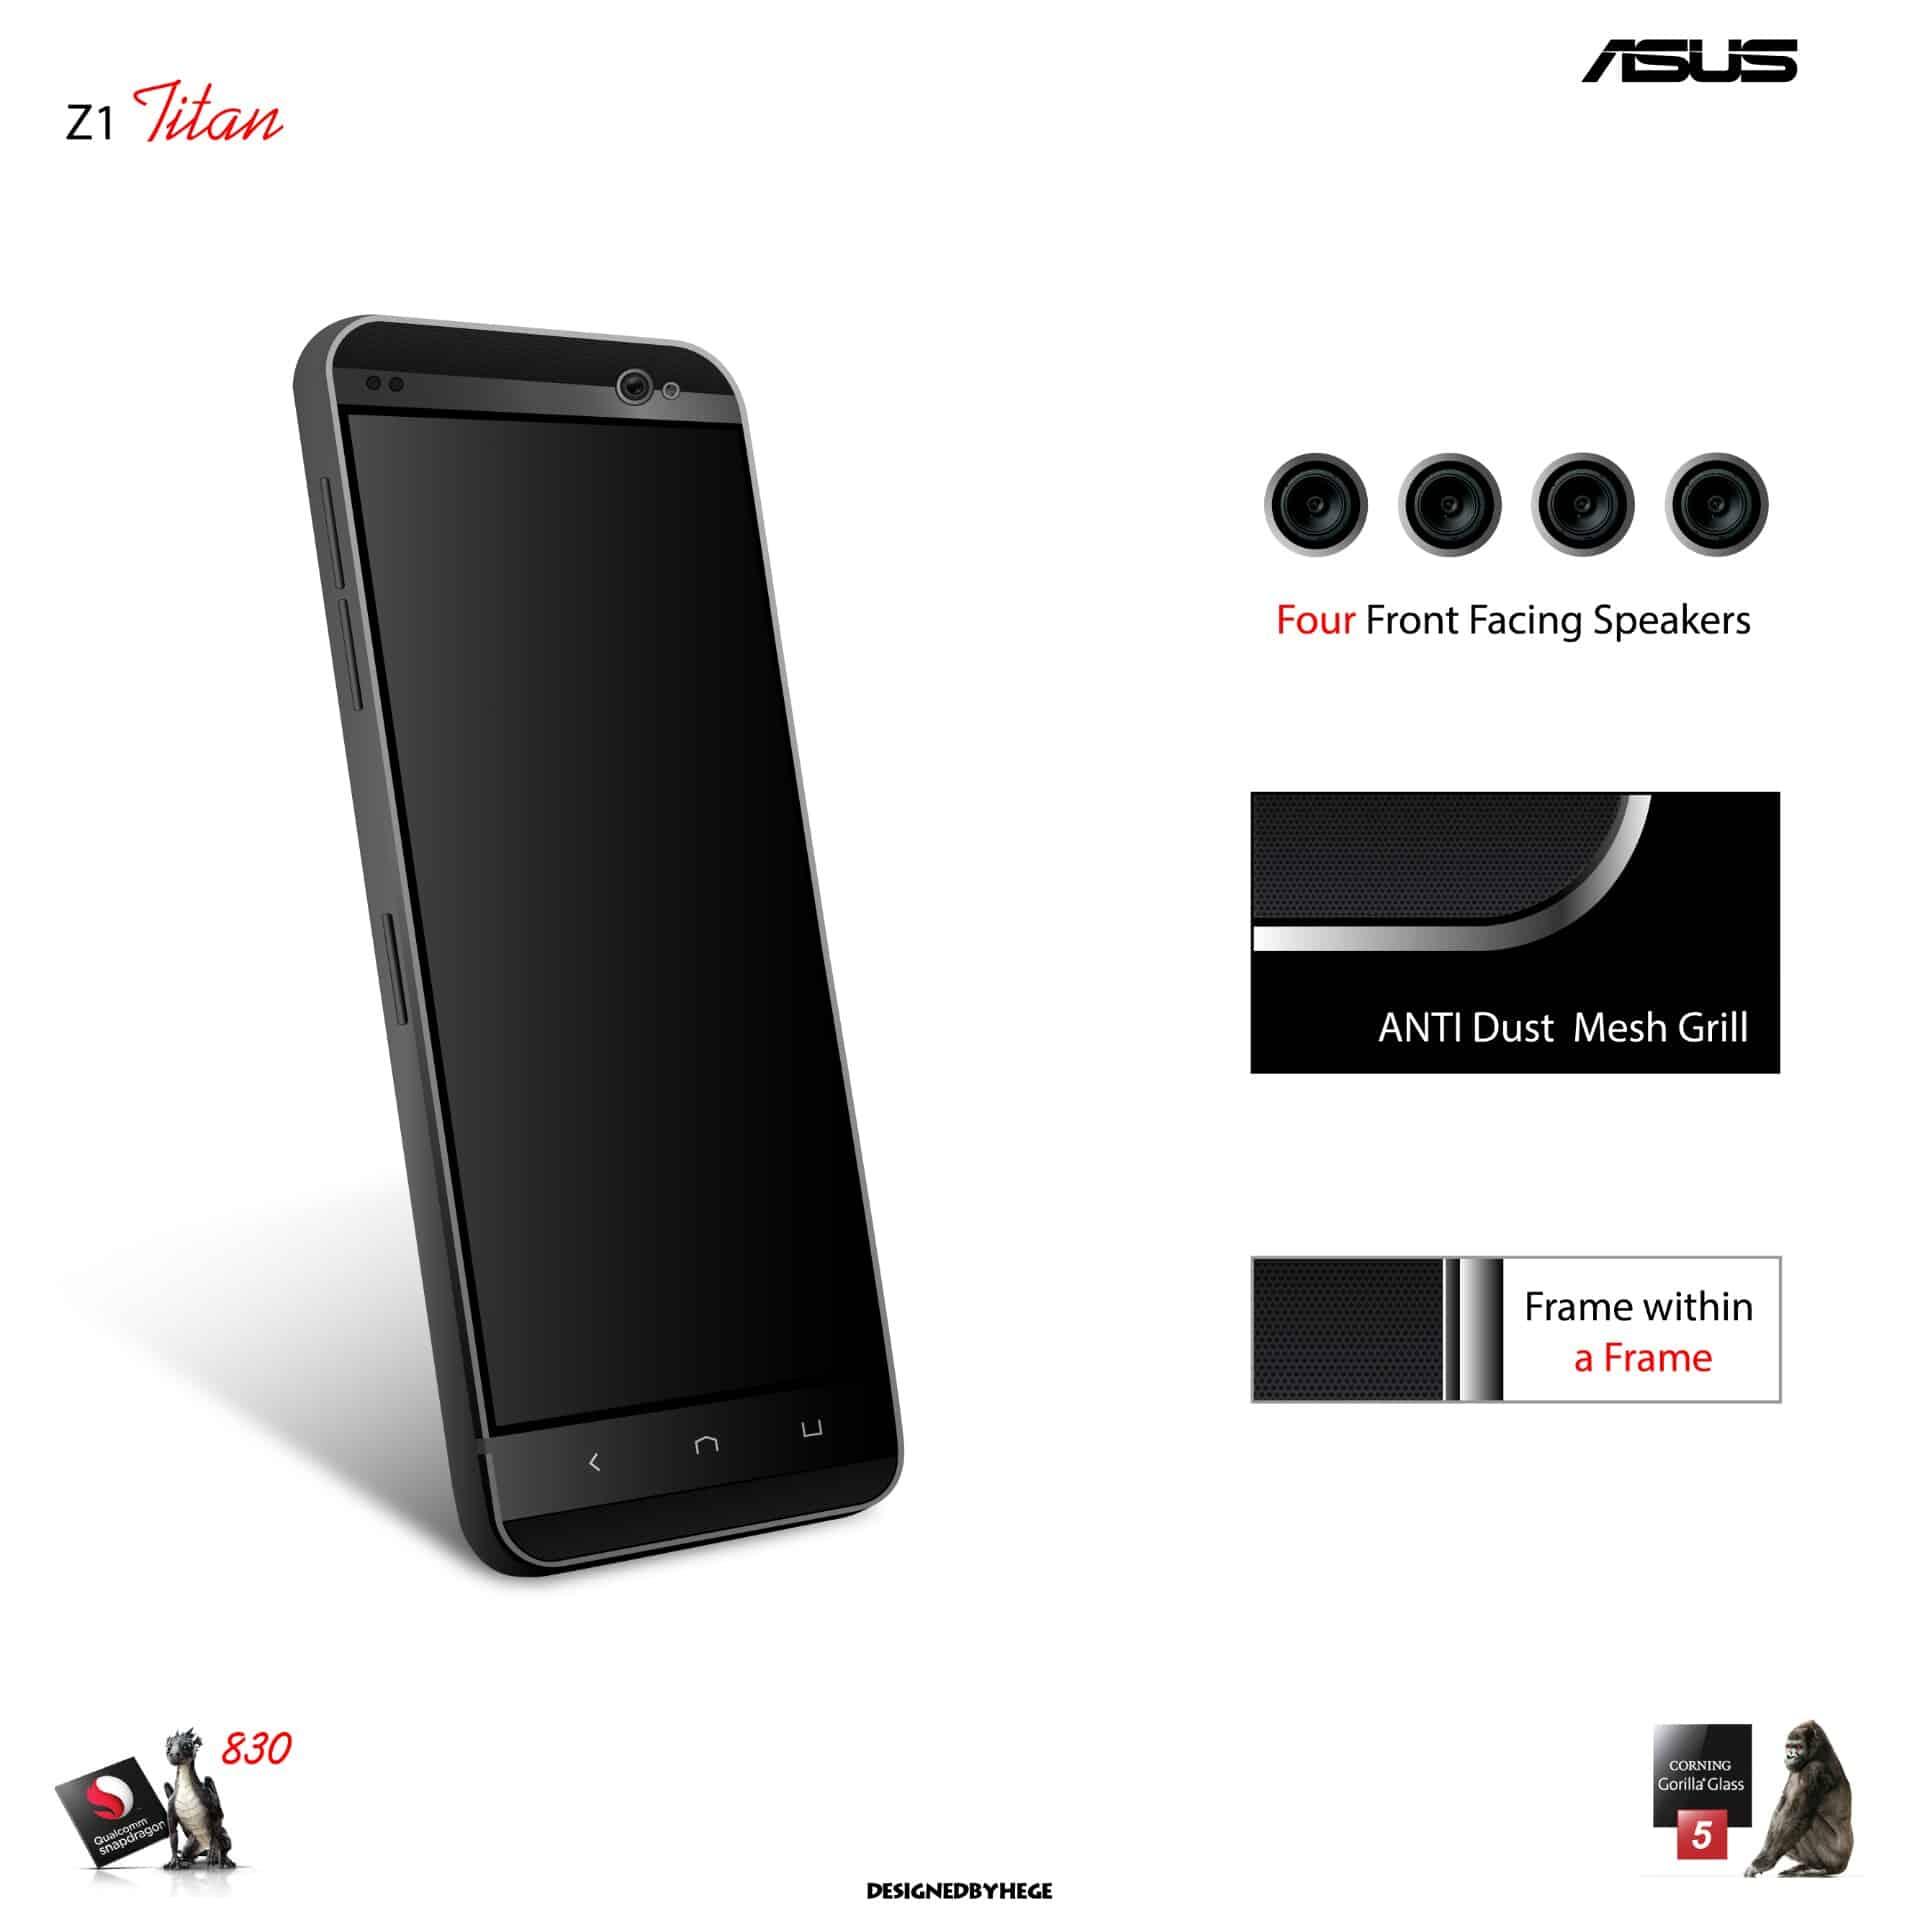 Asus Z1 Titan concept 4